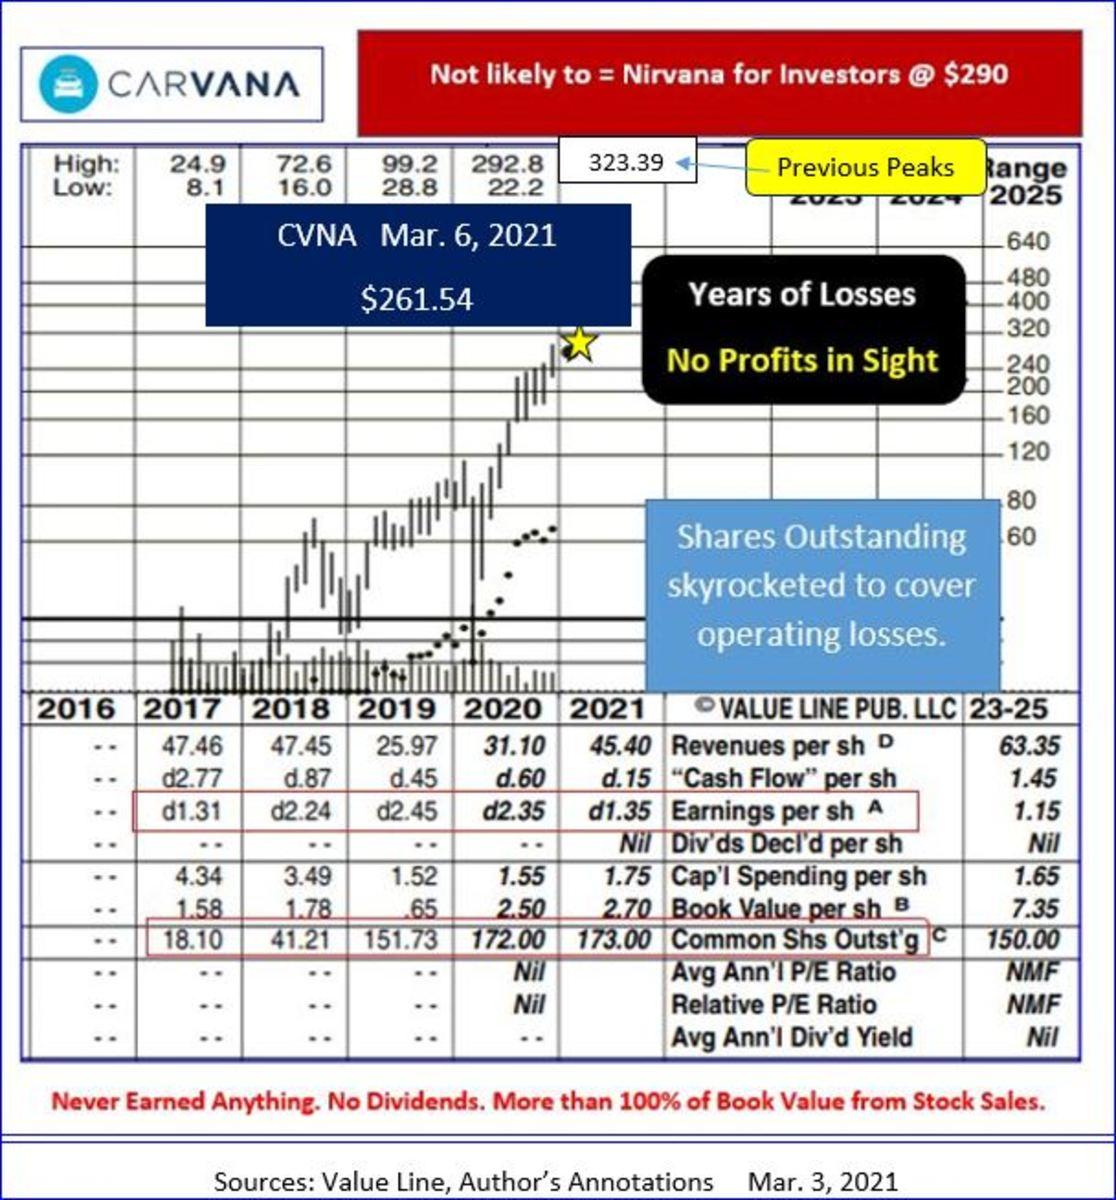 Carvana Value Line